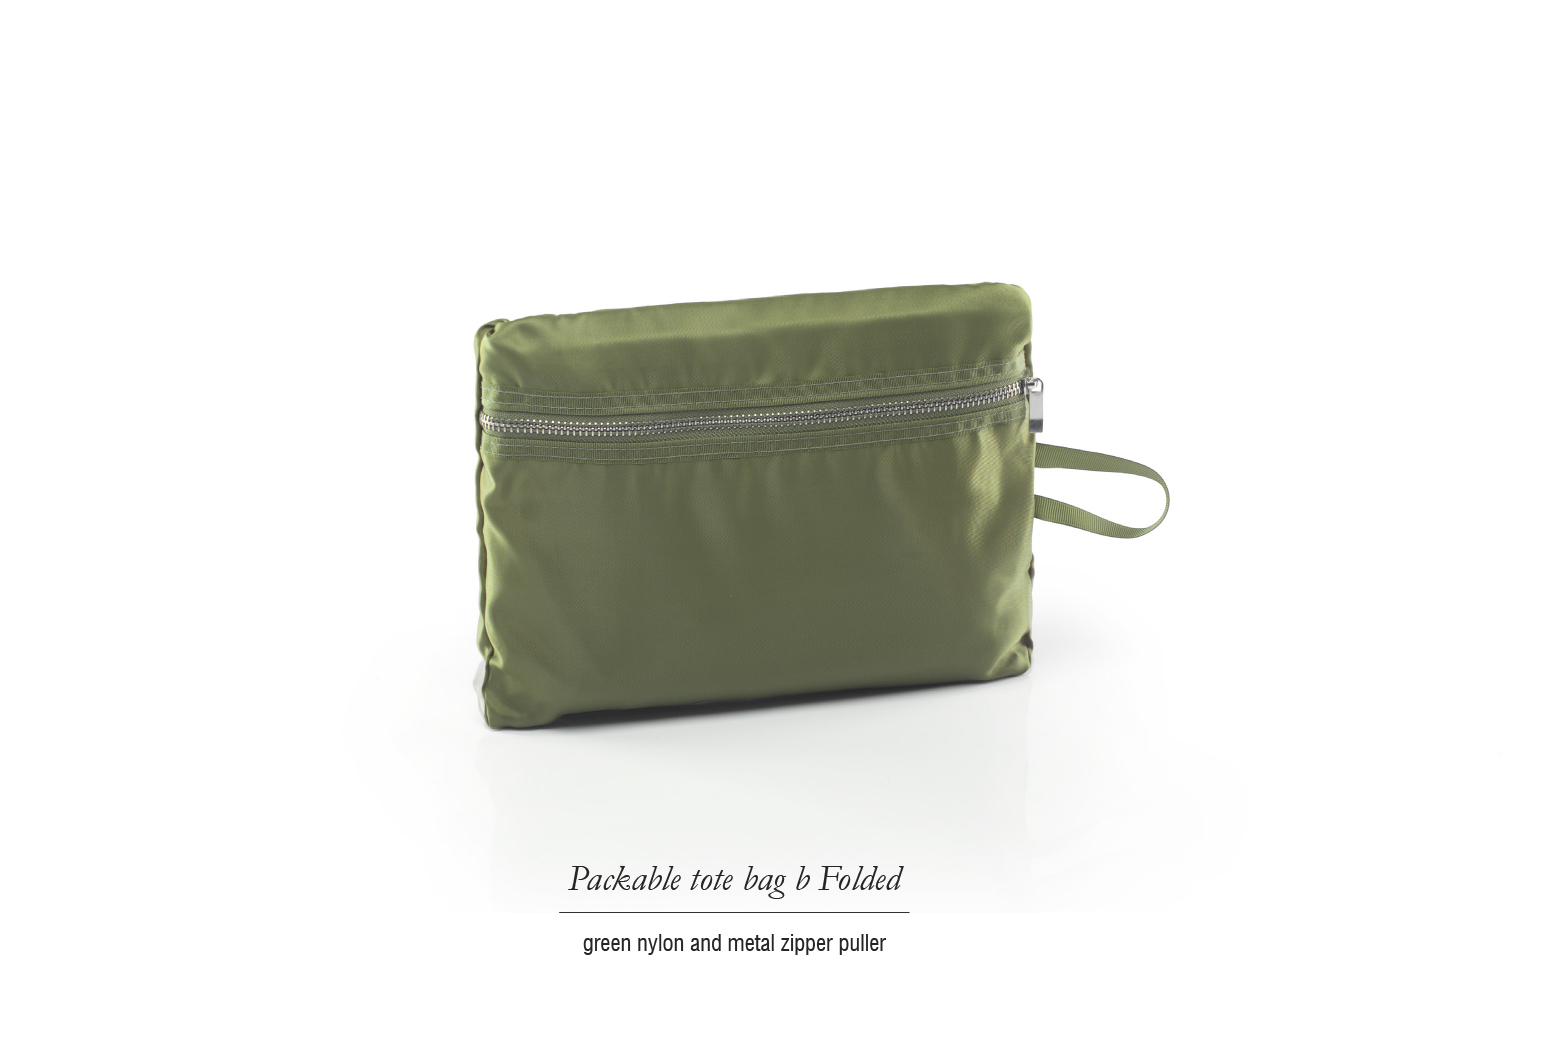 Amenity bags catalogue 2016_SHcollection_V6 95.jpg